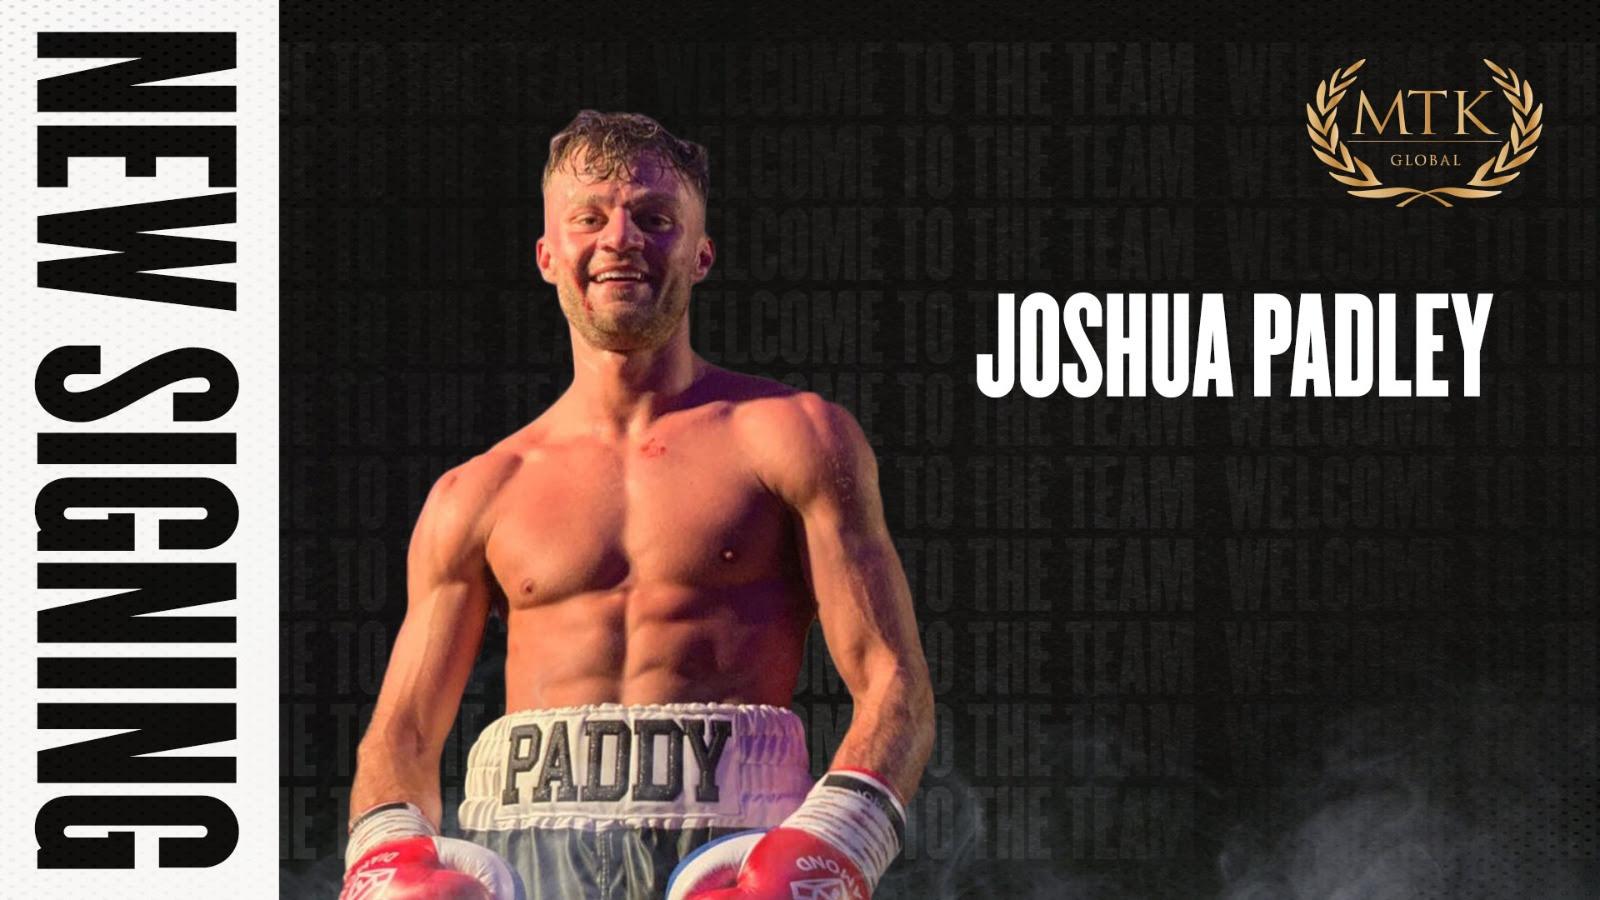 Josh Padley